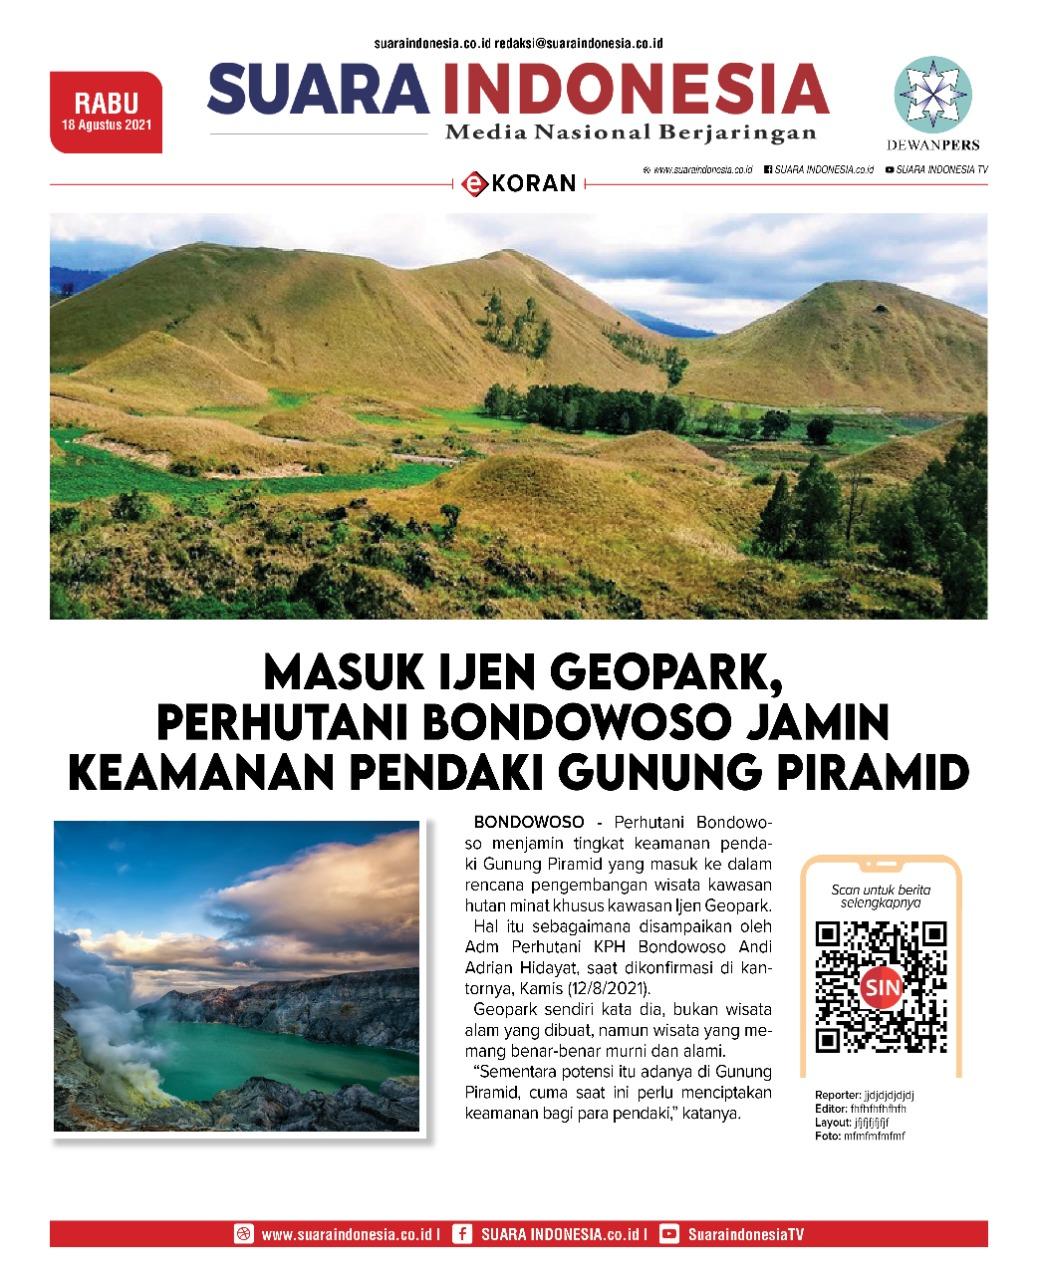 Ijen Geopark, Perhutani Bondowoso Jamin Keamanan Pendaki